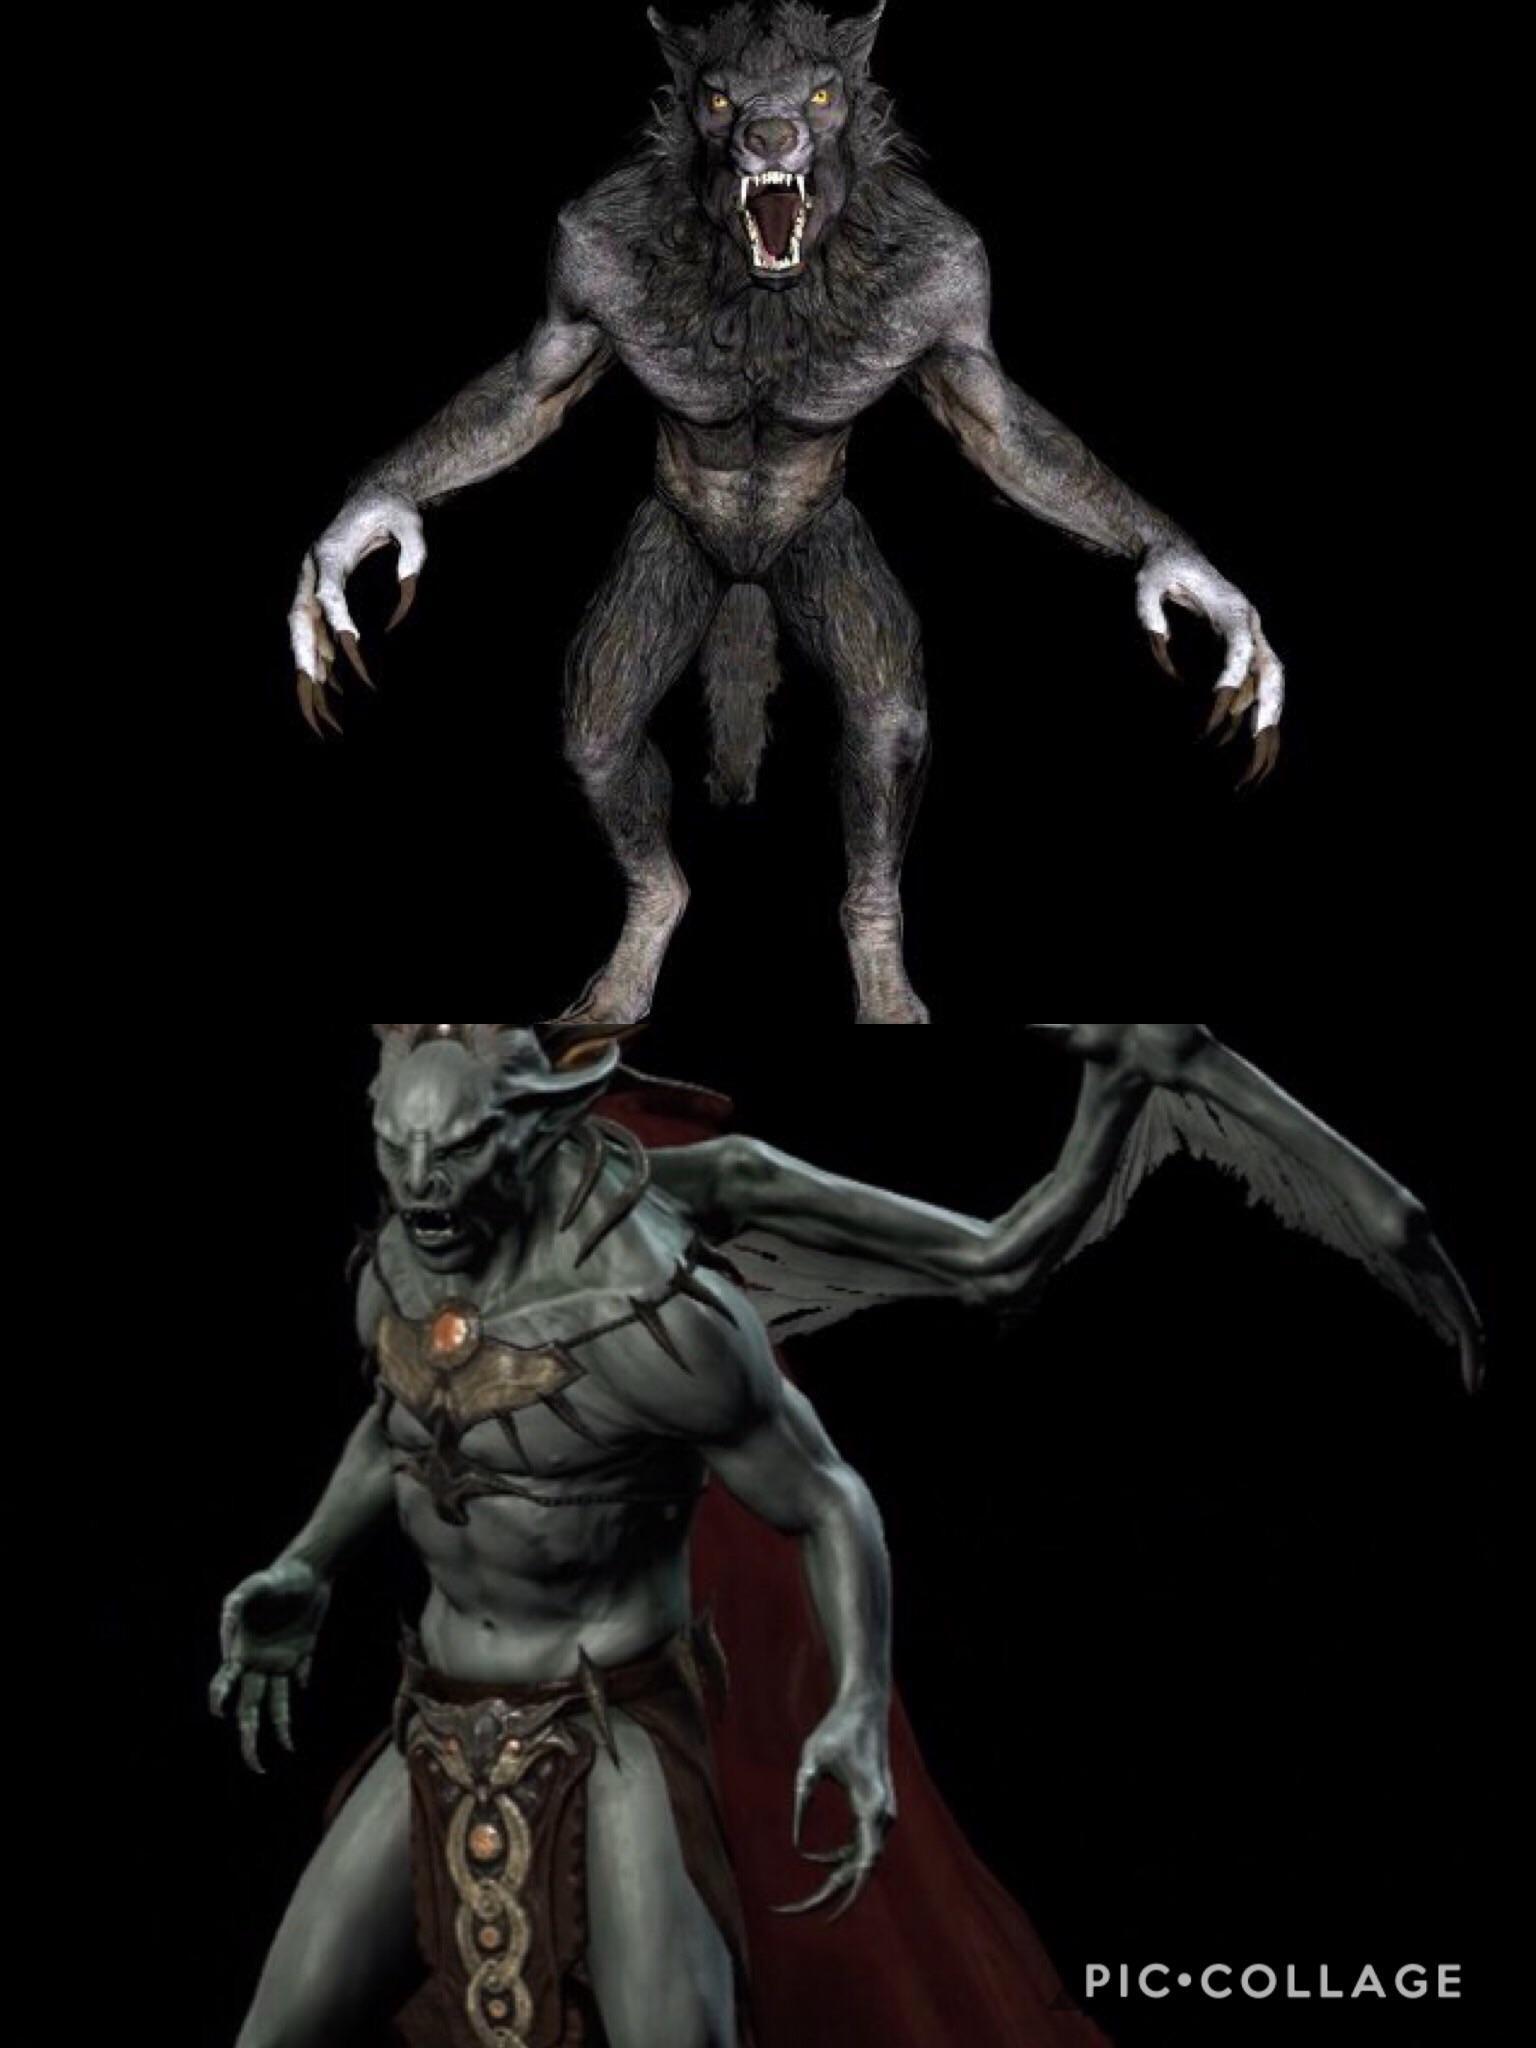 Werewolf lord skyrim